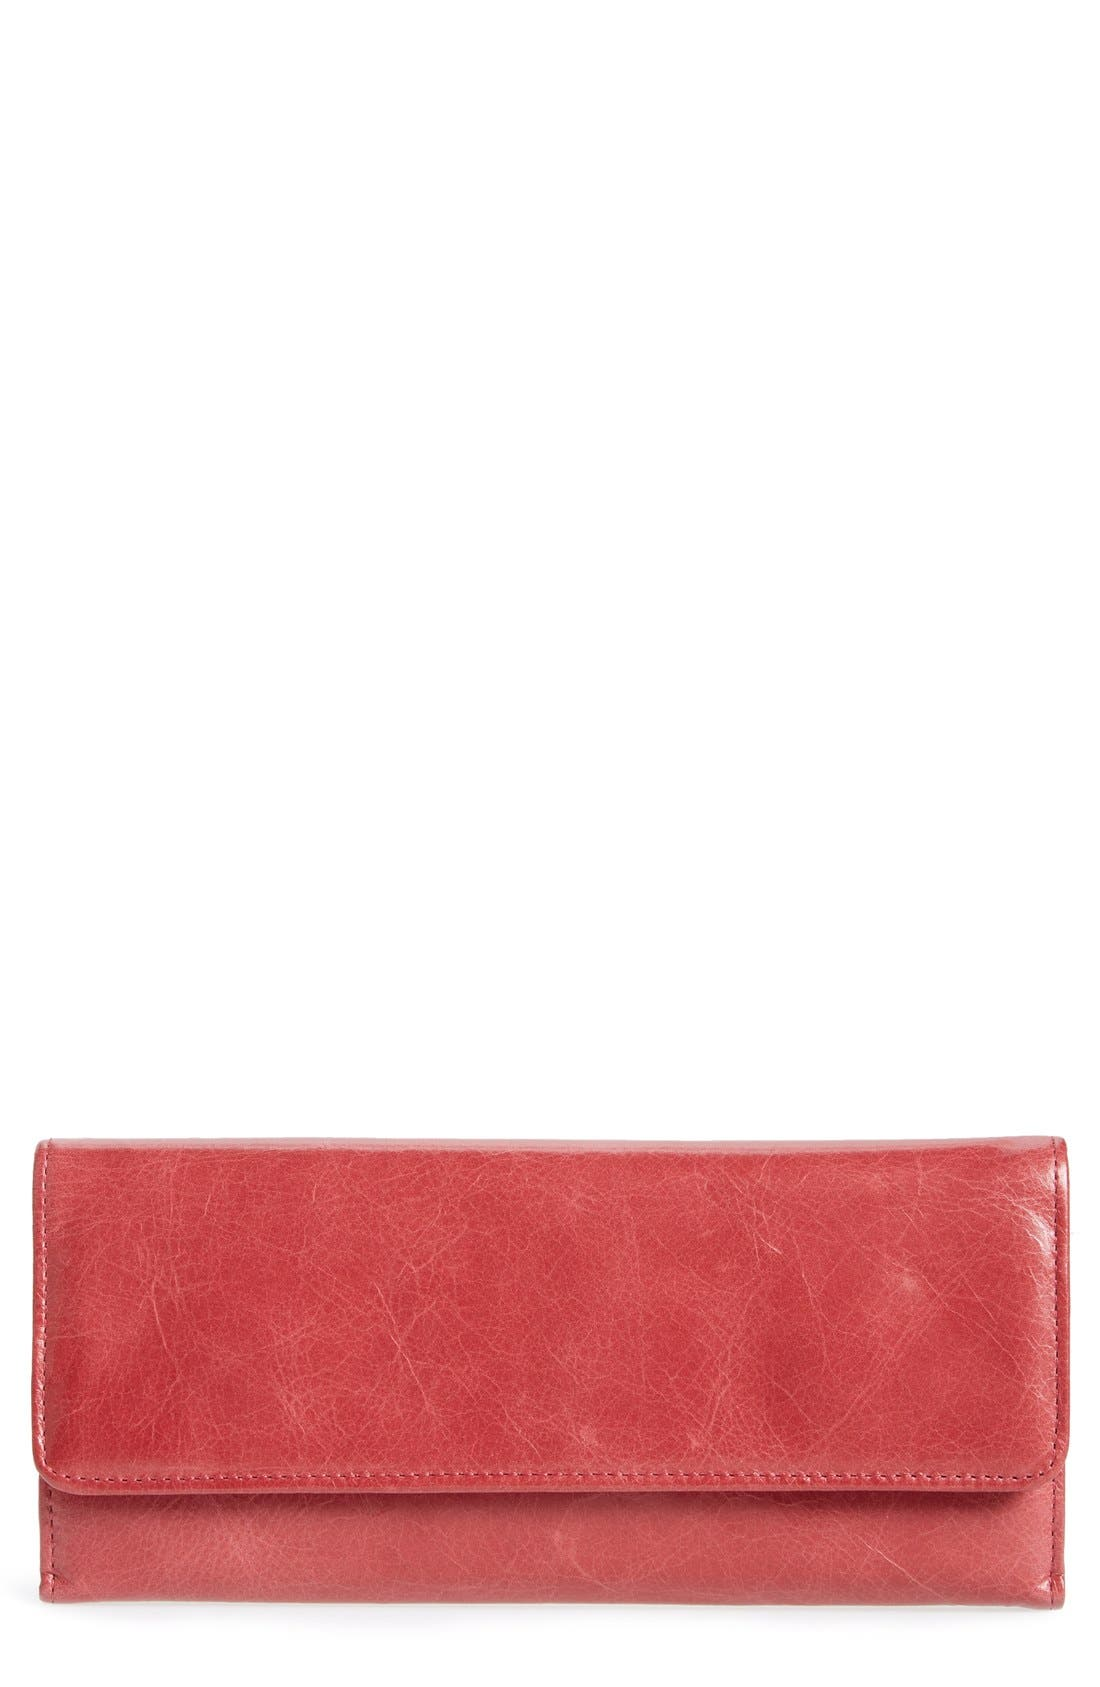 'Sadie' Leather Wallet,                             Main thumbnail 56, color,